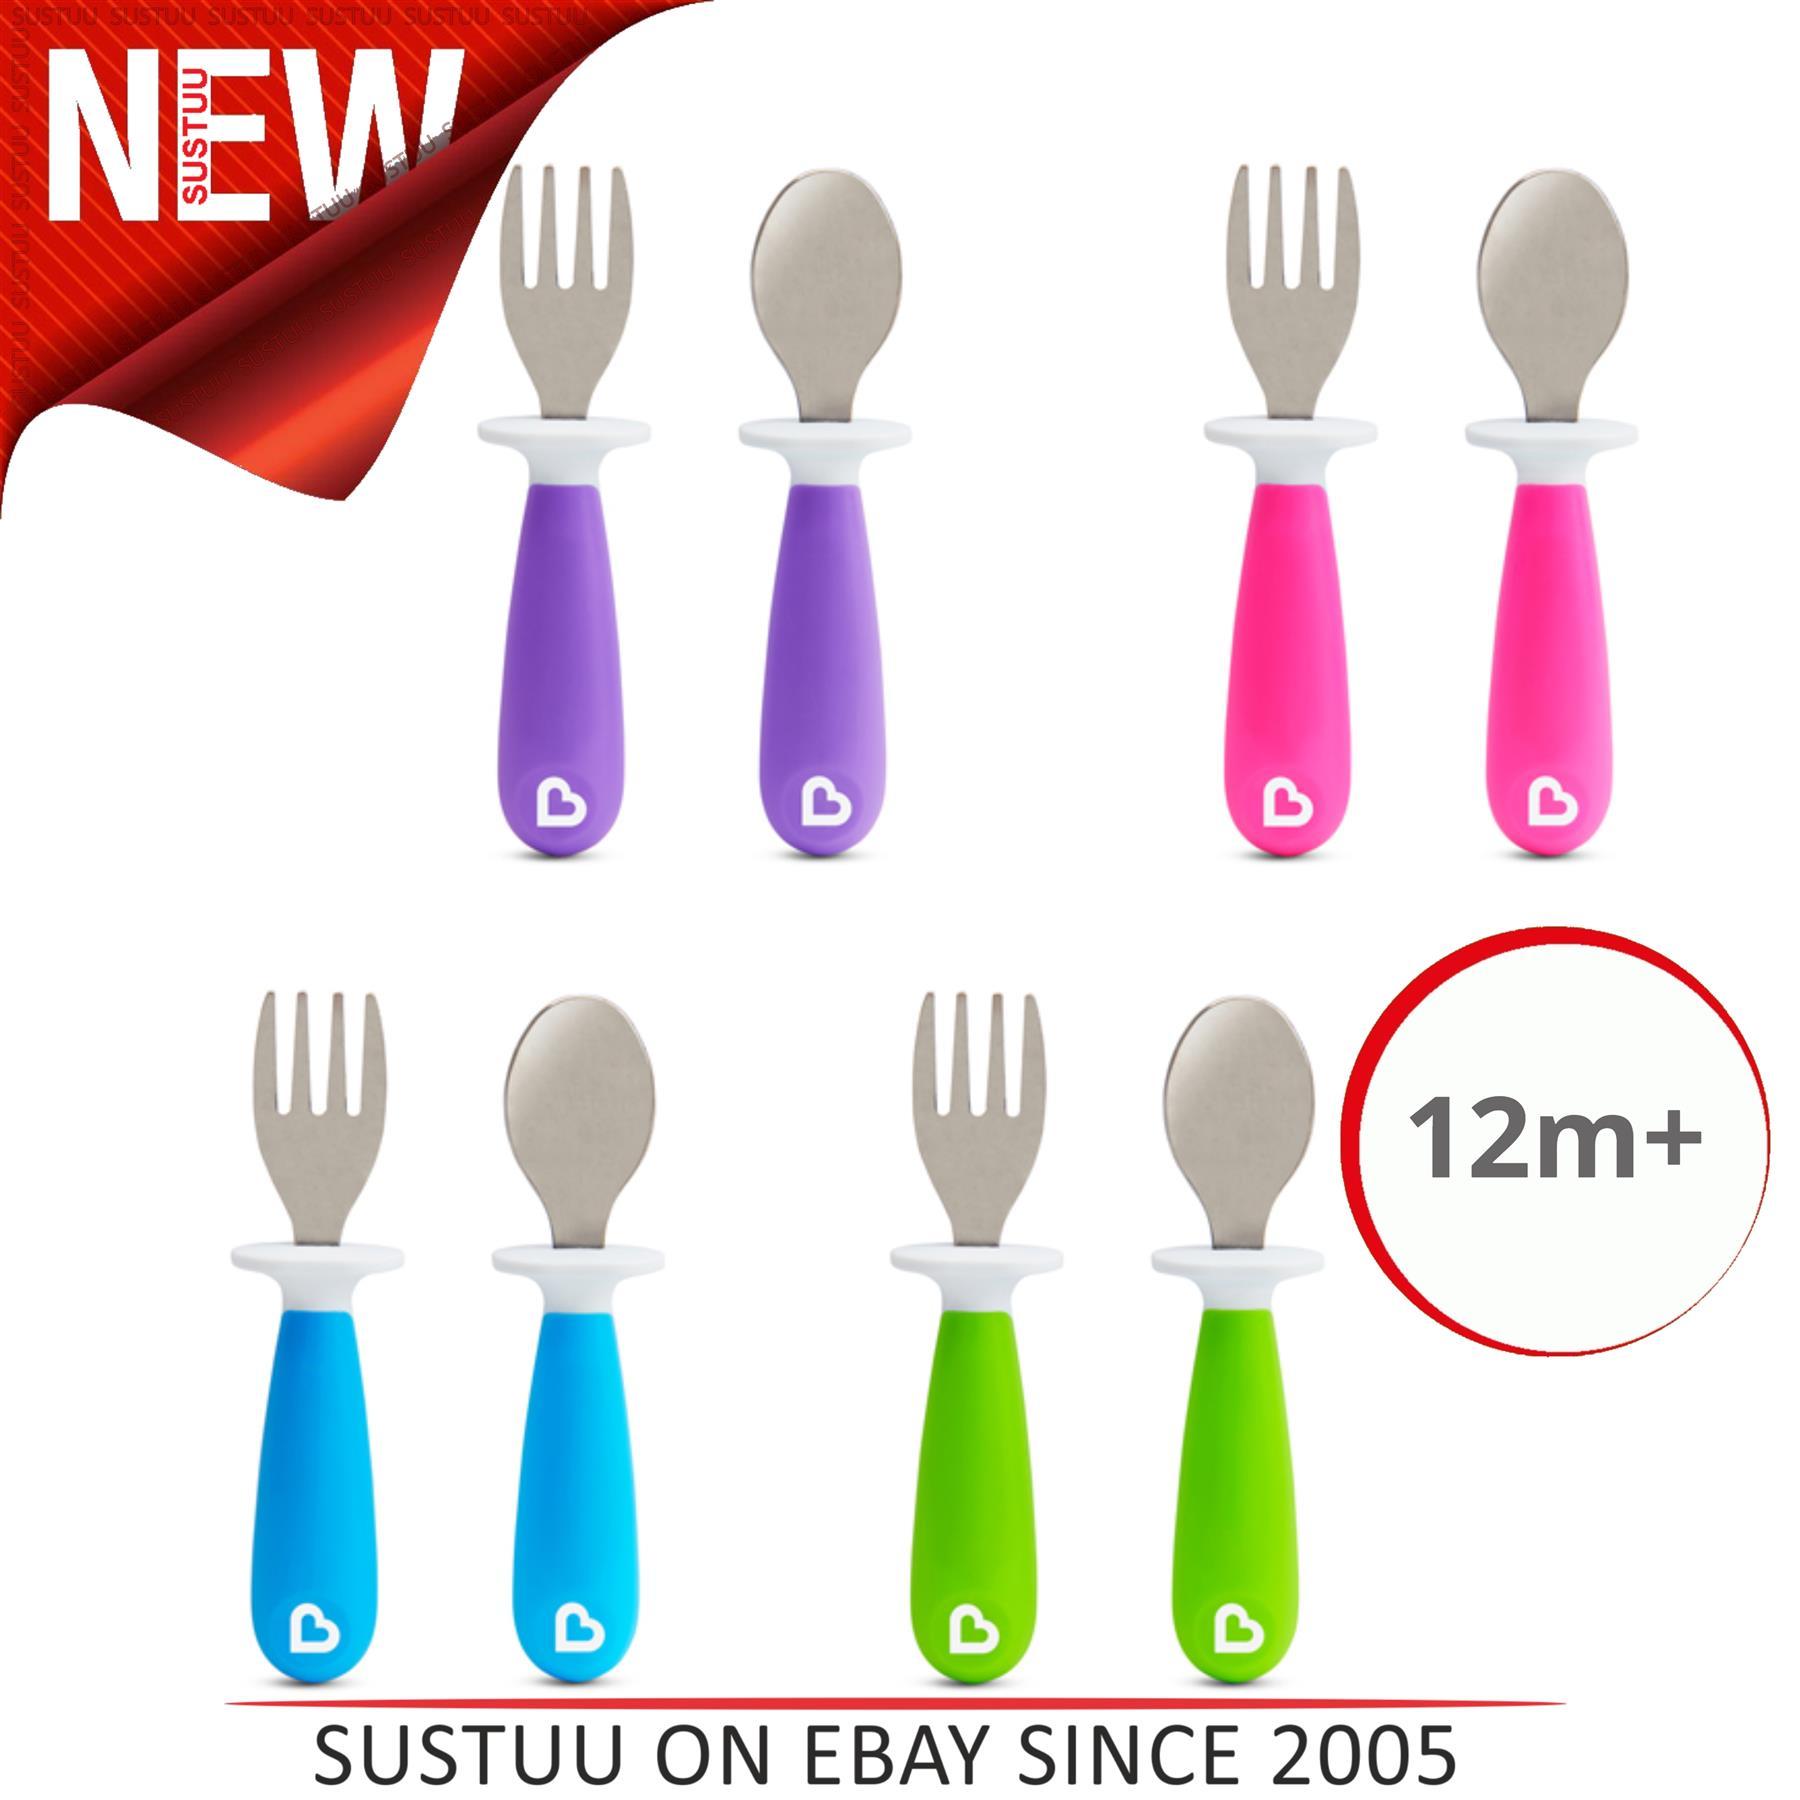 Munchkin Raise Fork /& Spoon Set|Baby Self Feeding Utensils Cutlery|Blue|12m+